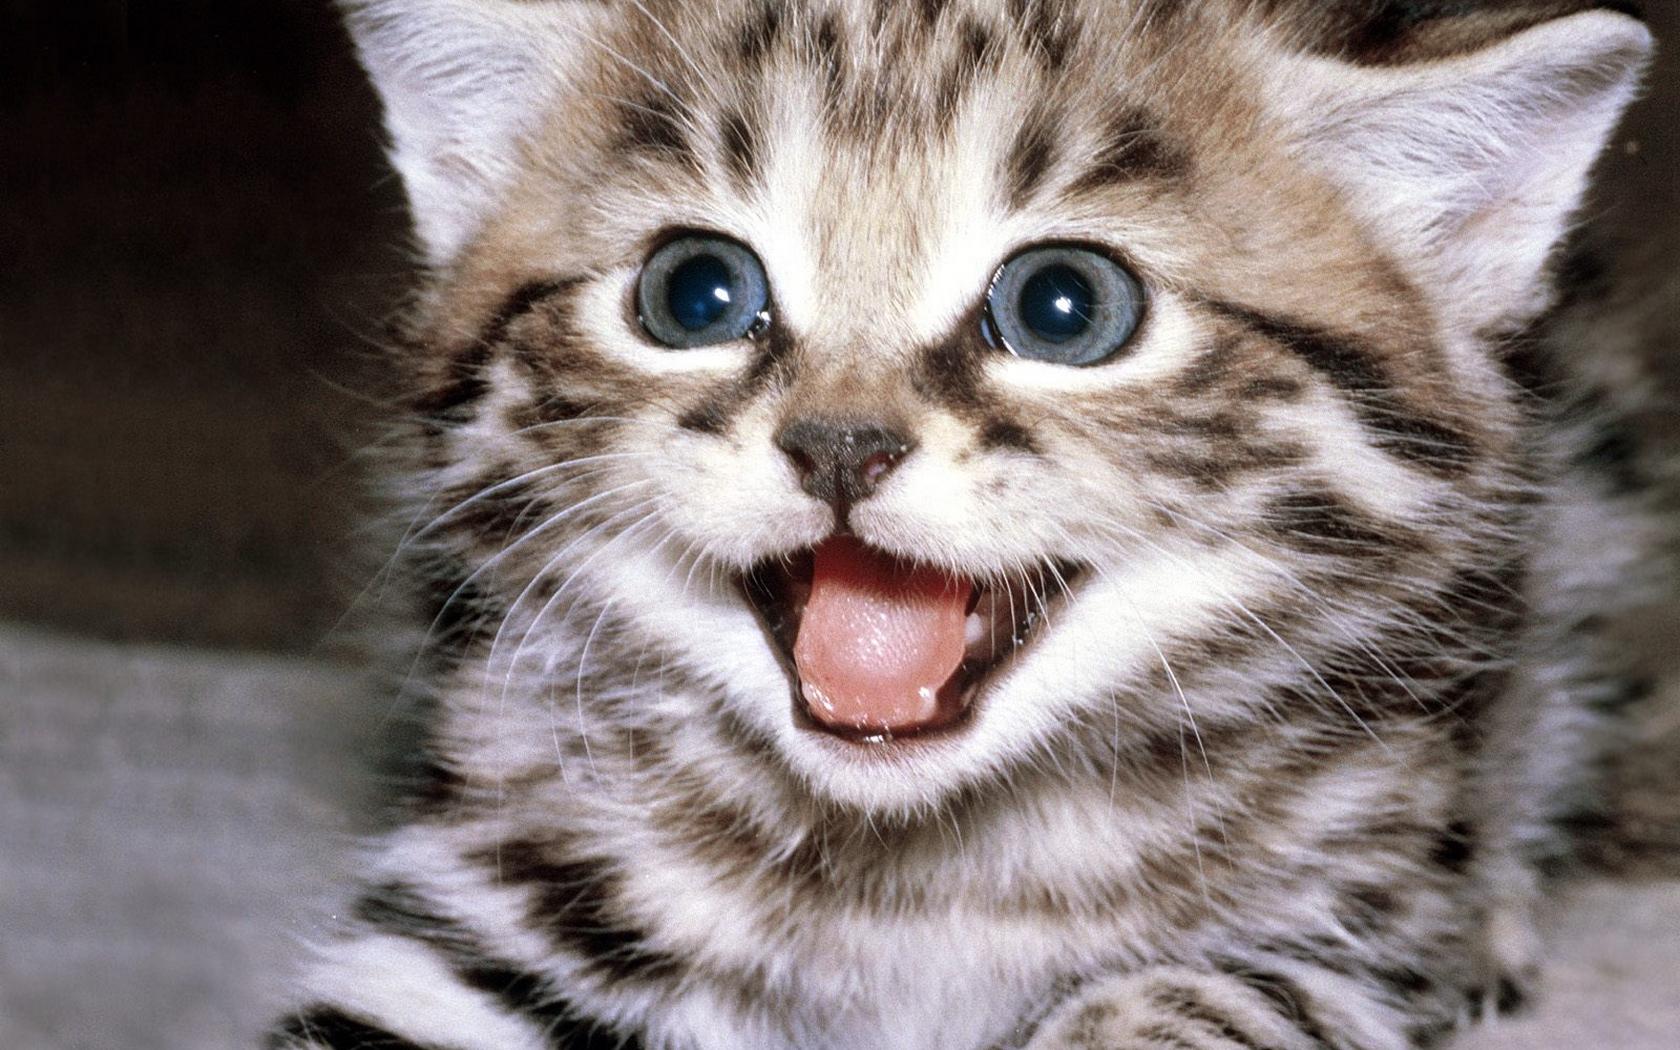 котенок, морда, глаза